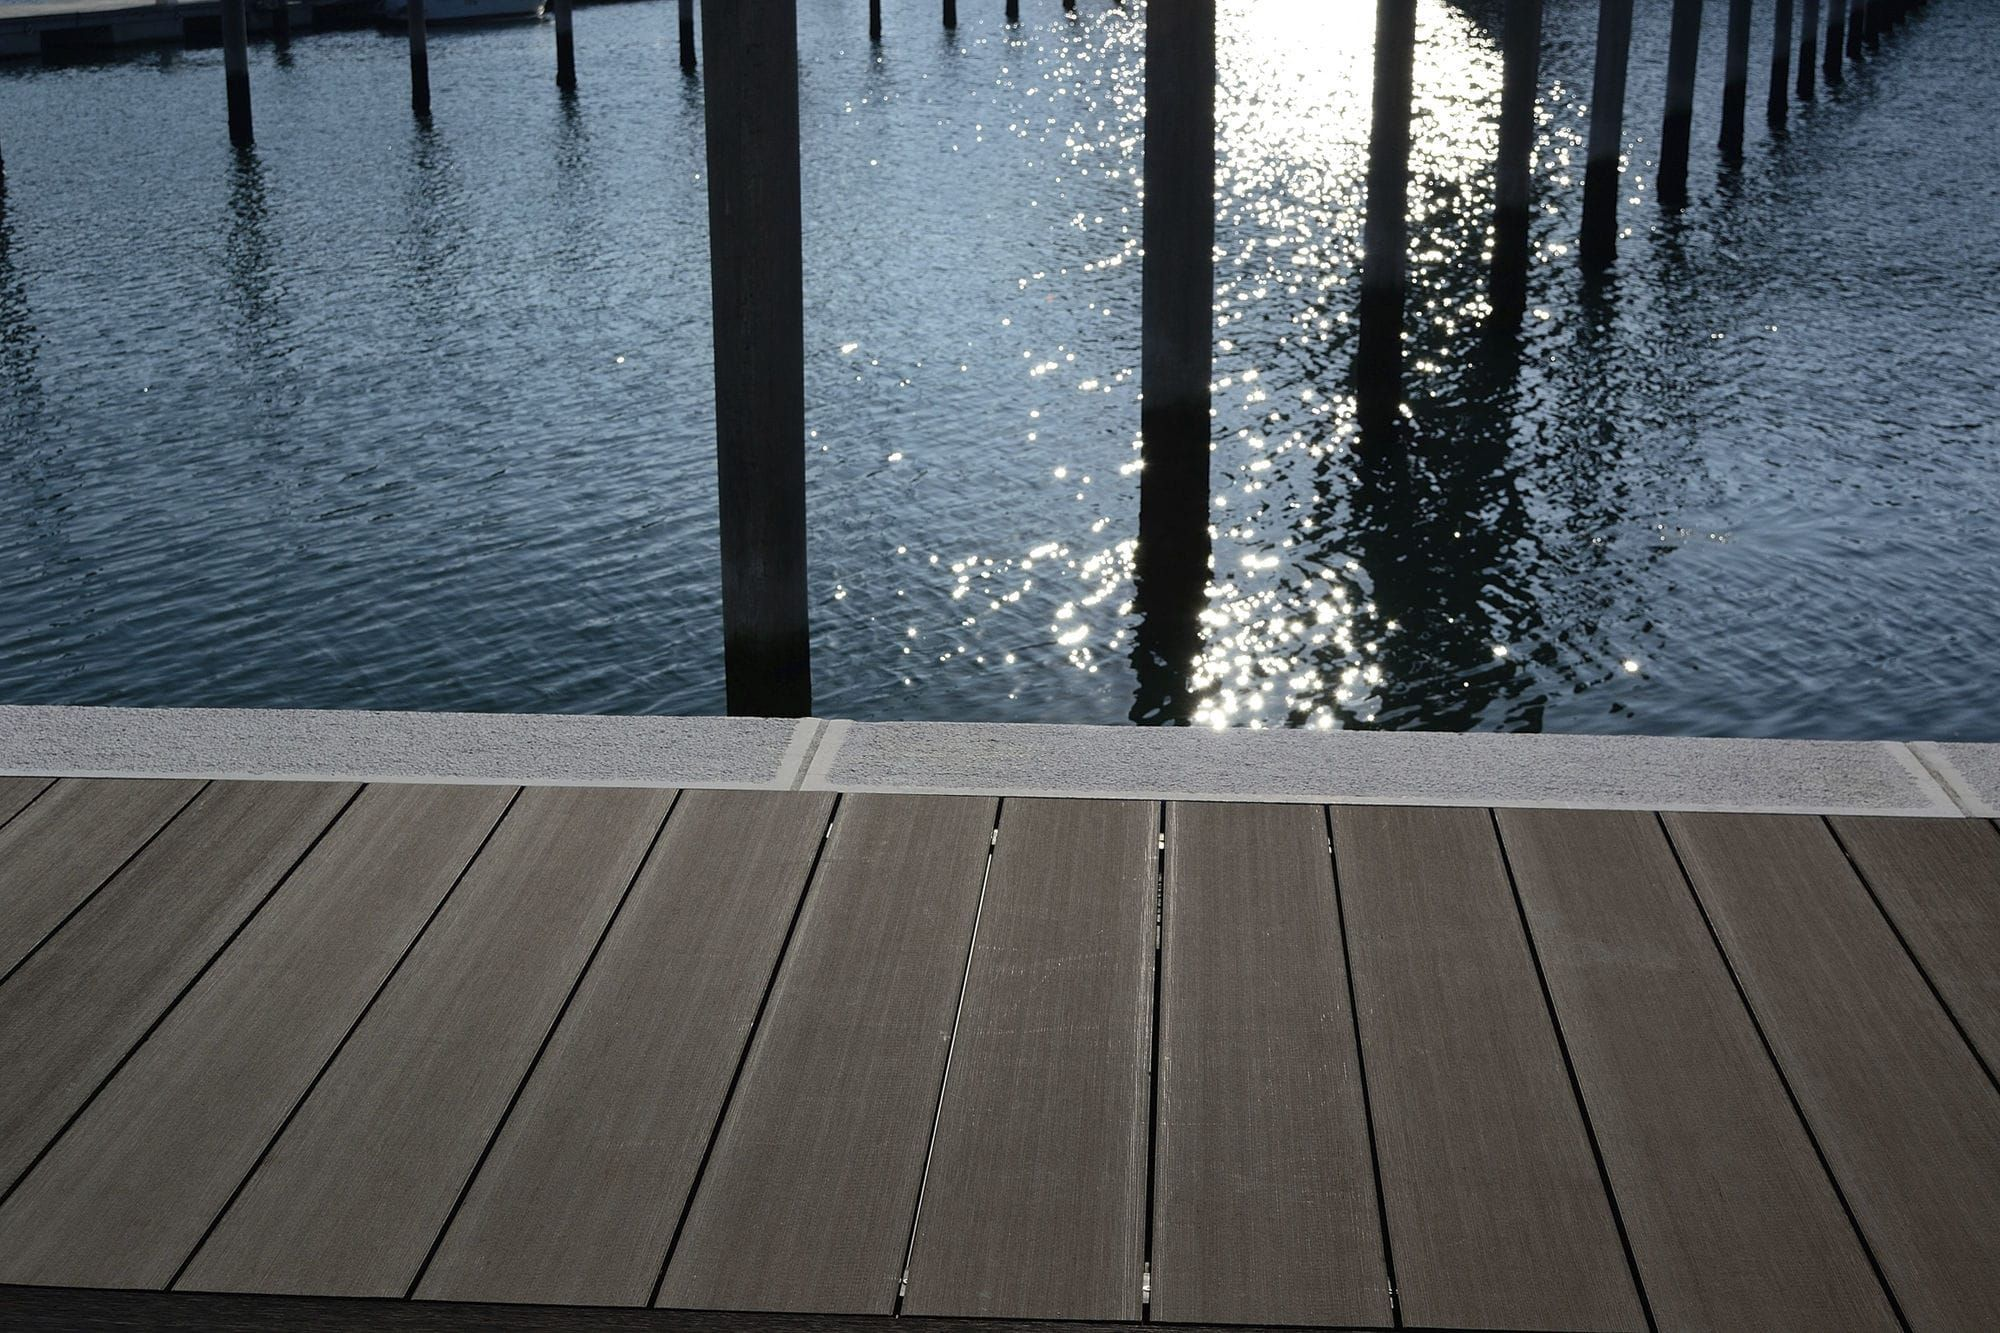 American Wood Plastic Composite Deck Pool Deck Plans Composite Decking Decking Options